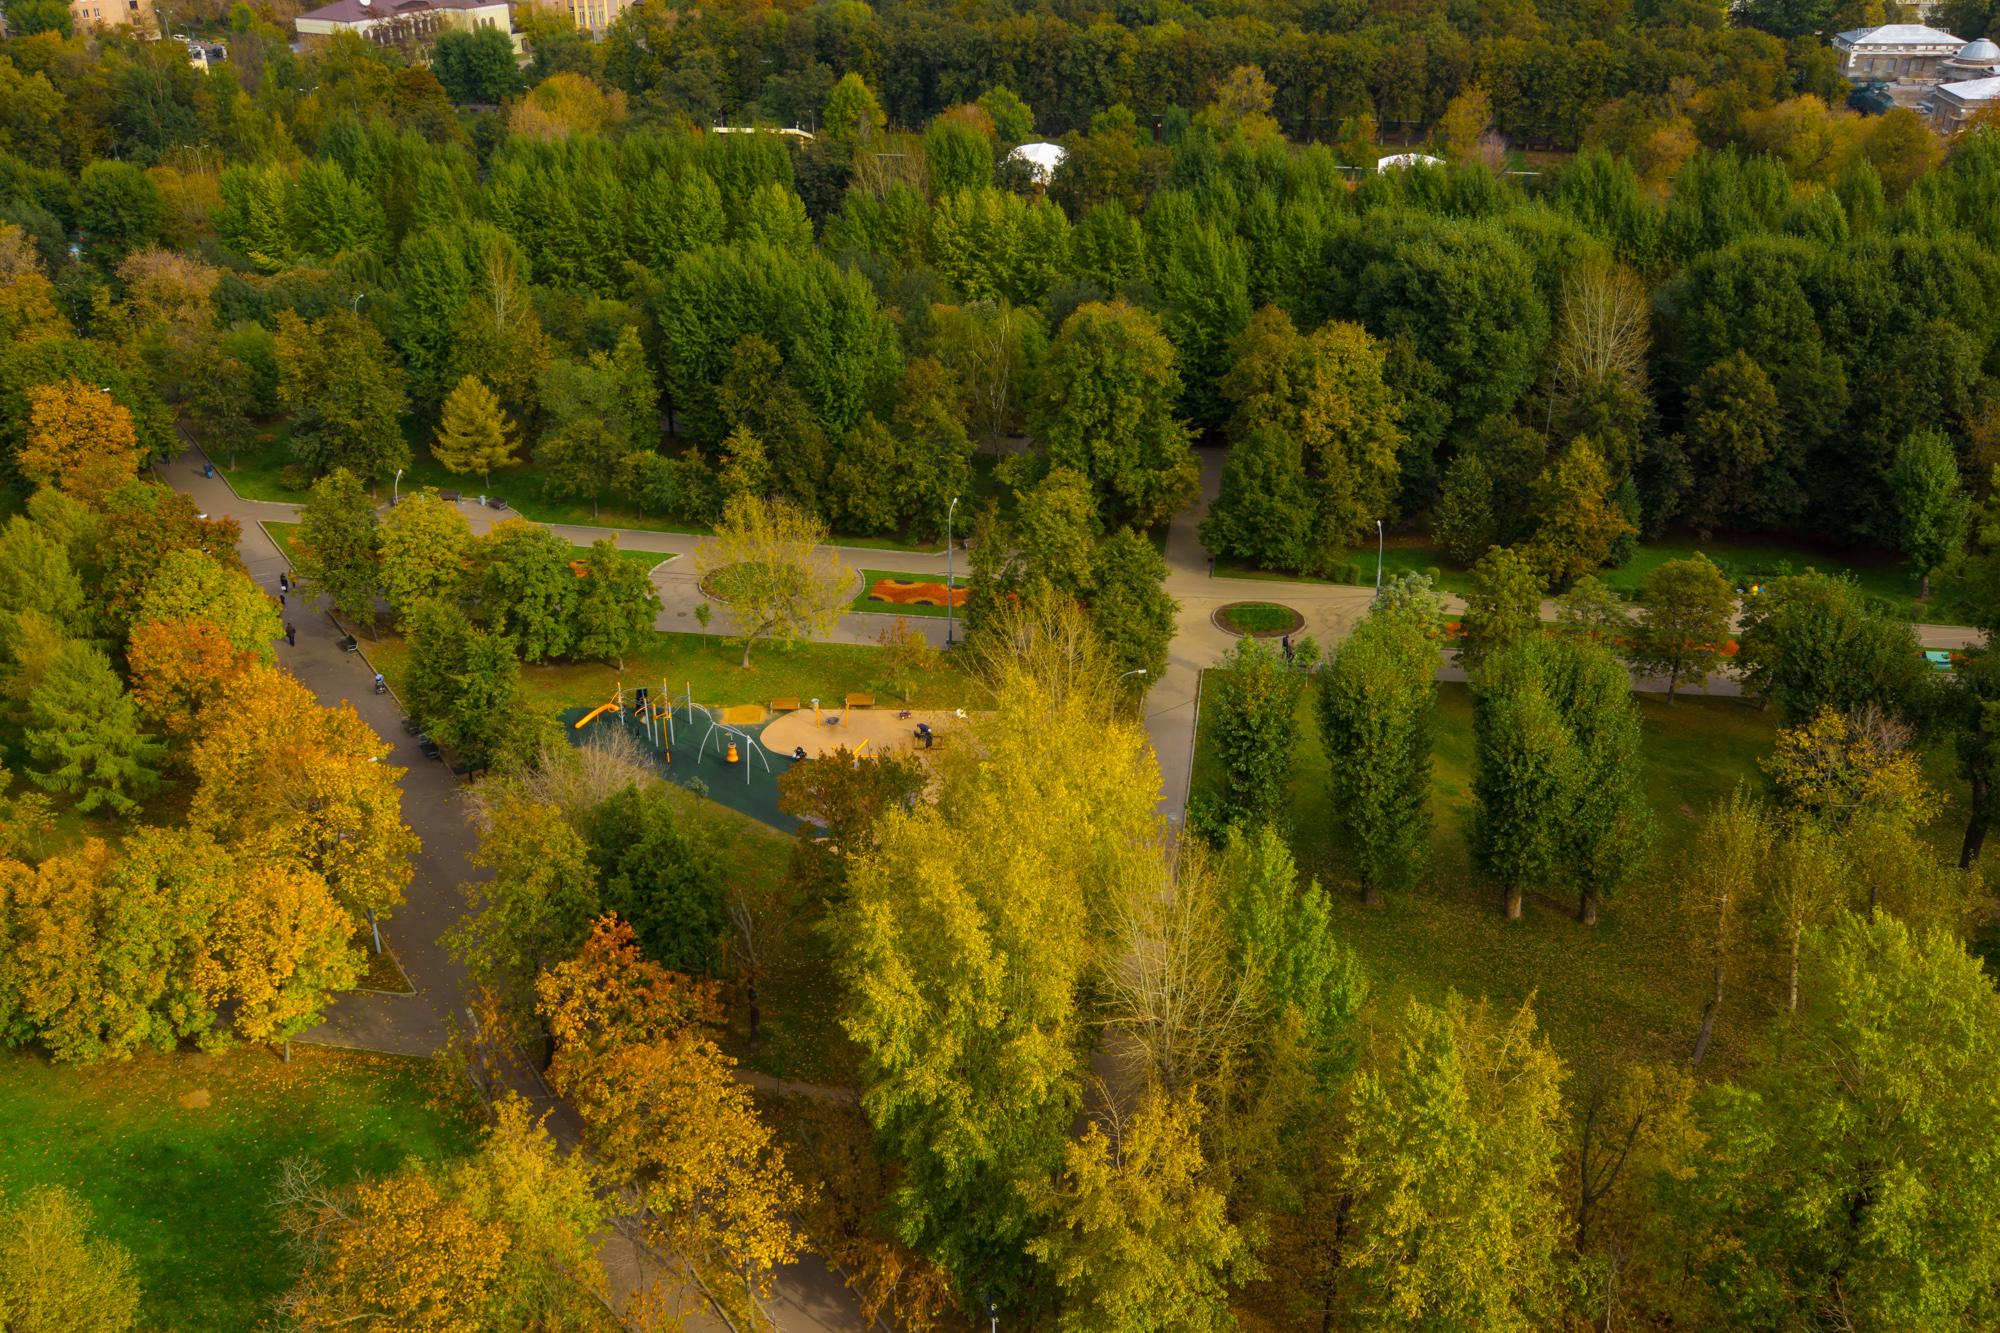 Herbst-Park oben